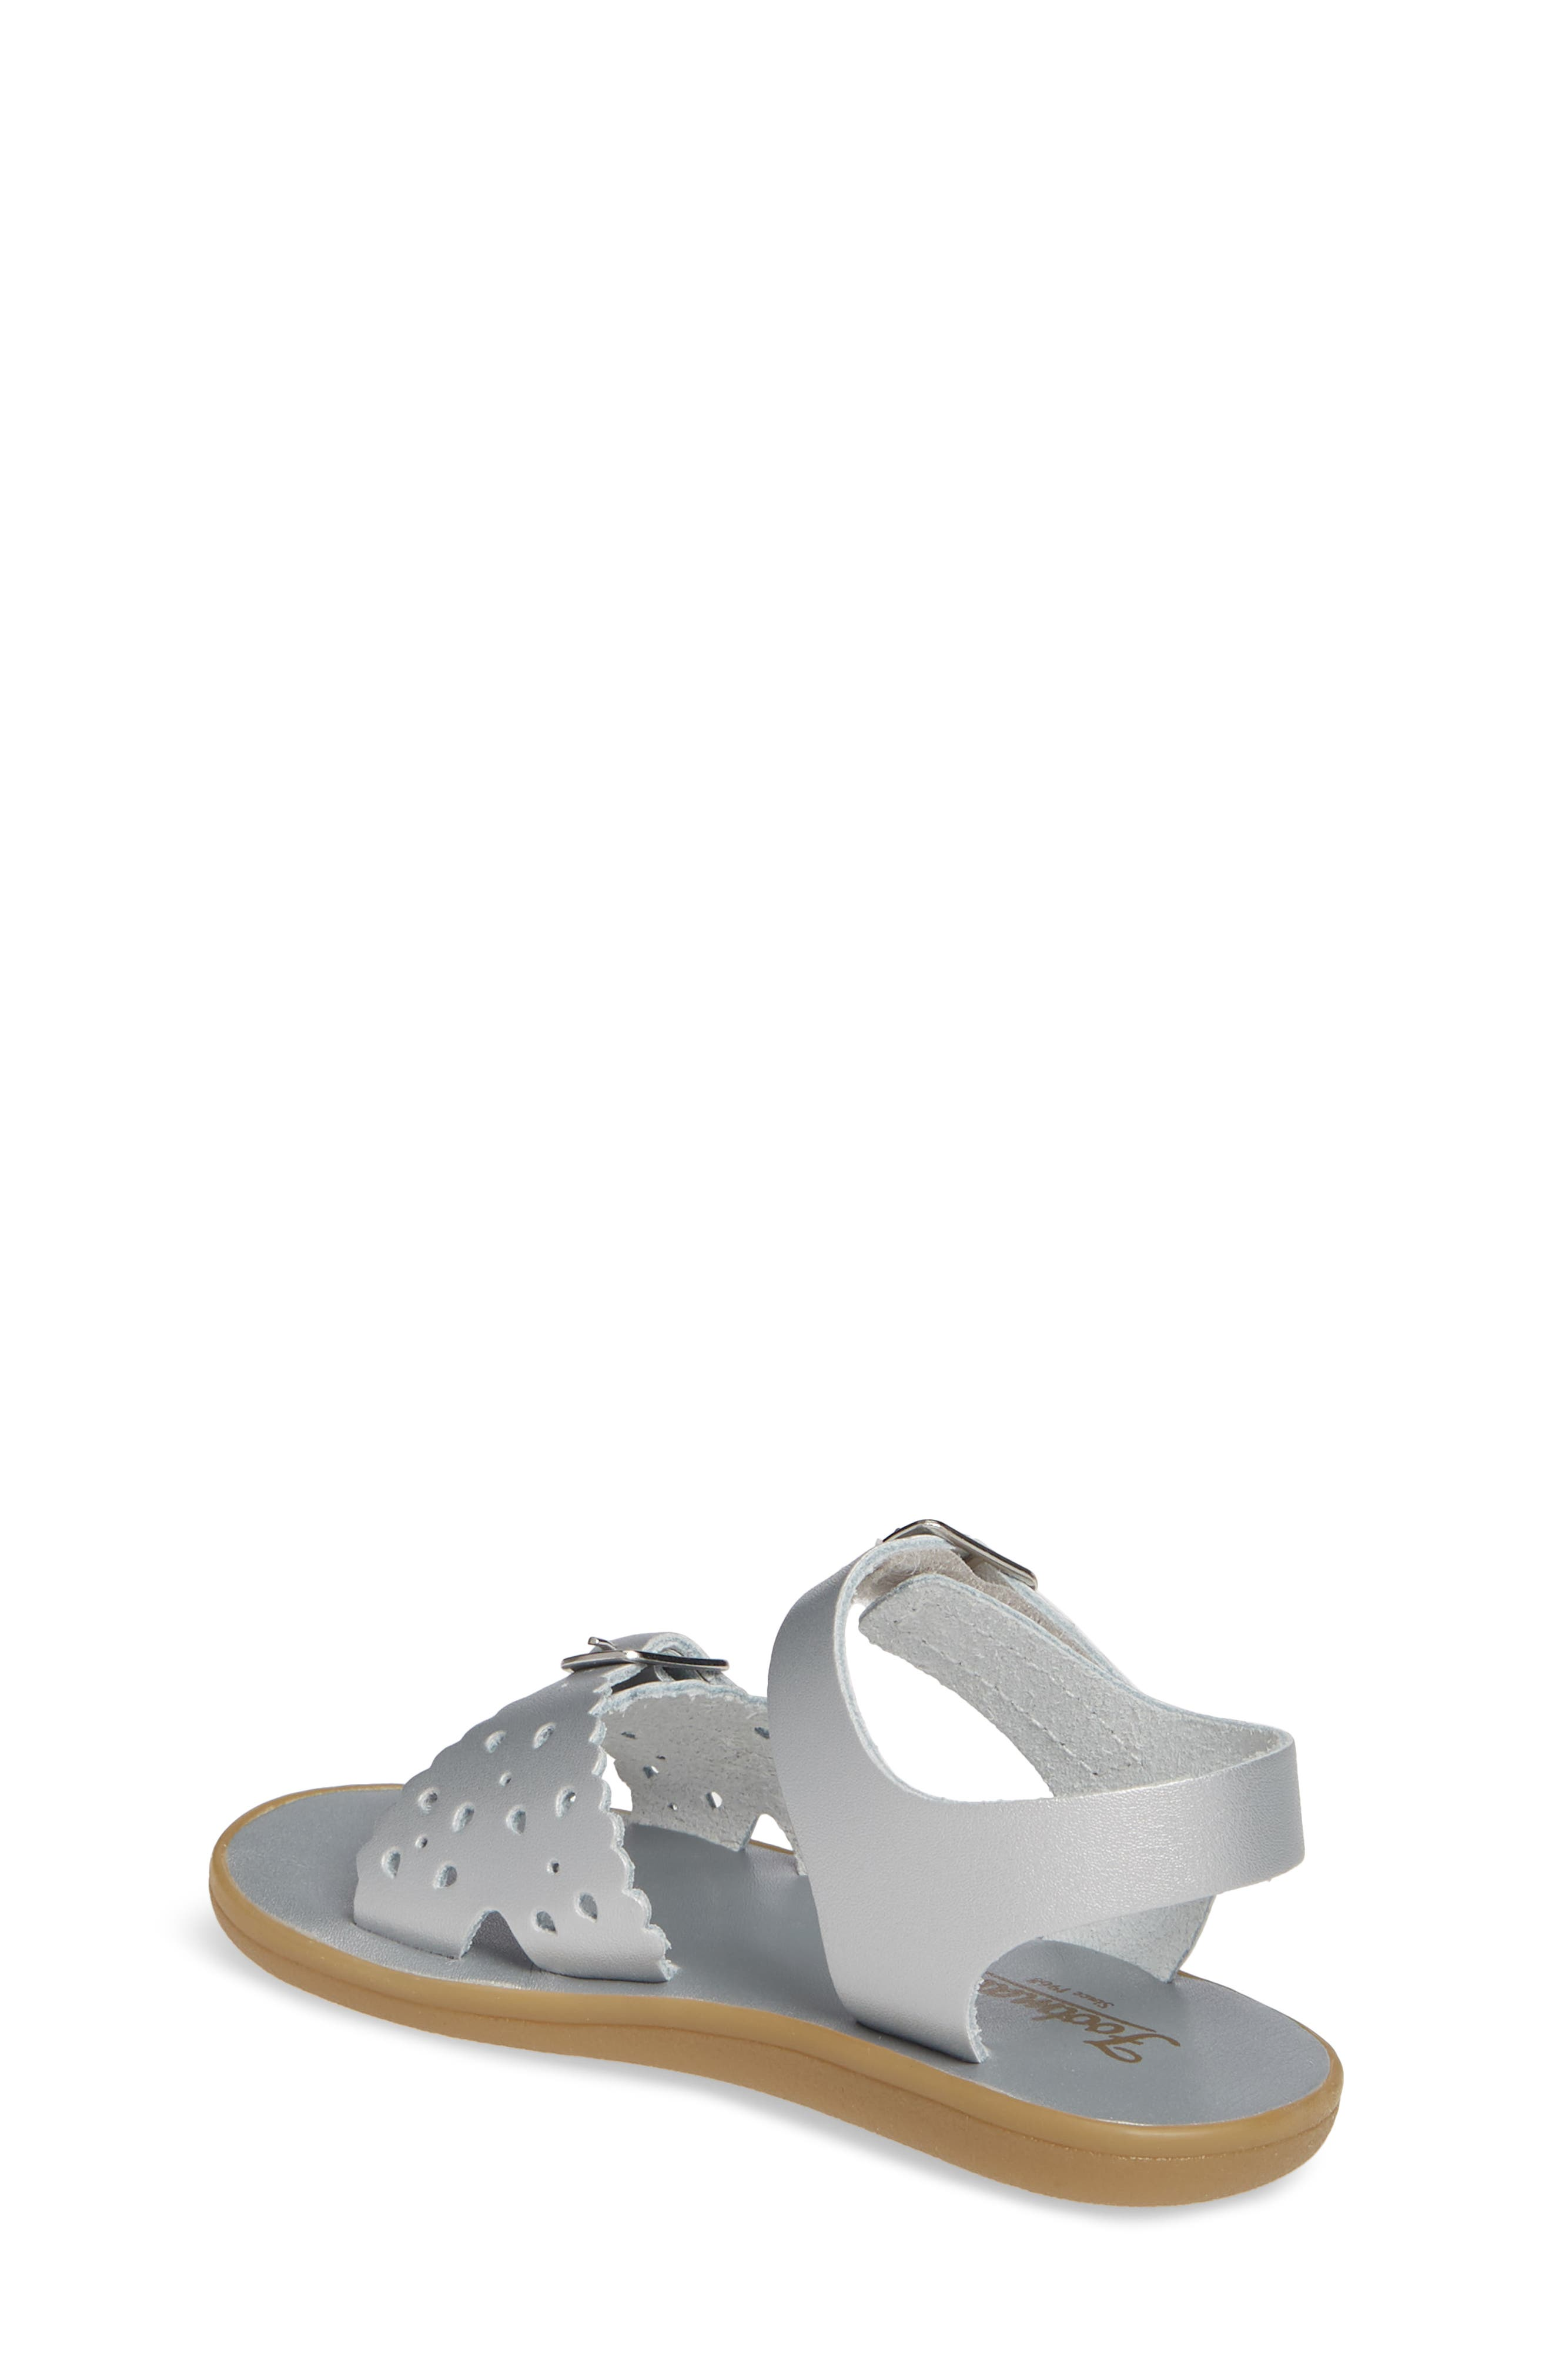 FOOTMATES,                             Arie Waterproof Sandal,                             Alternate thumbnail 2, color,                             SILVER